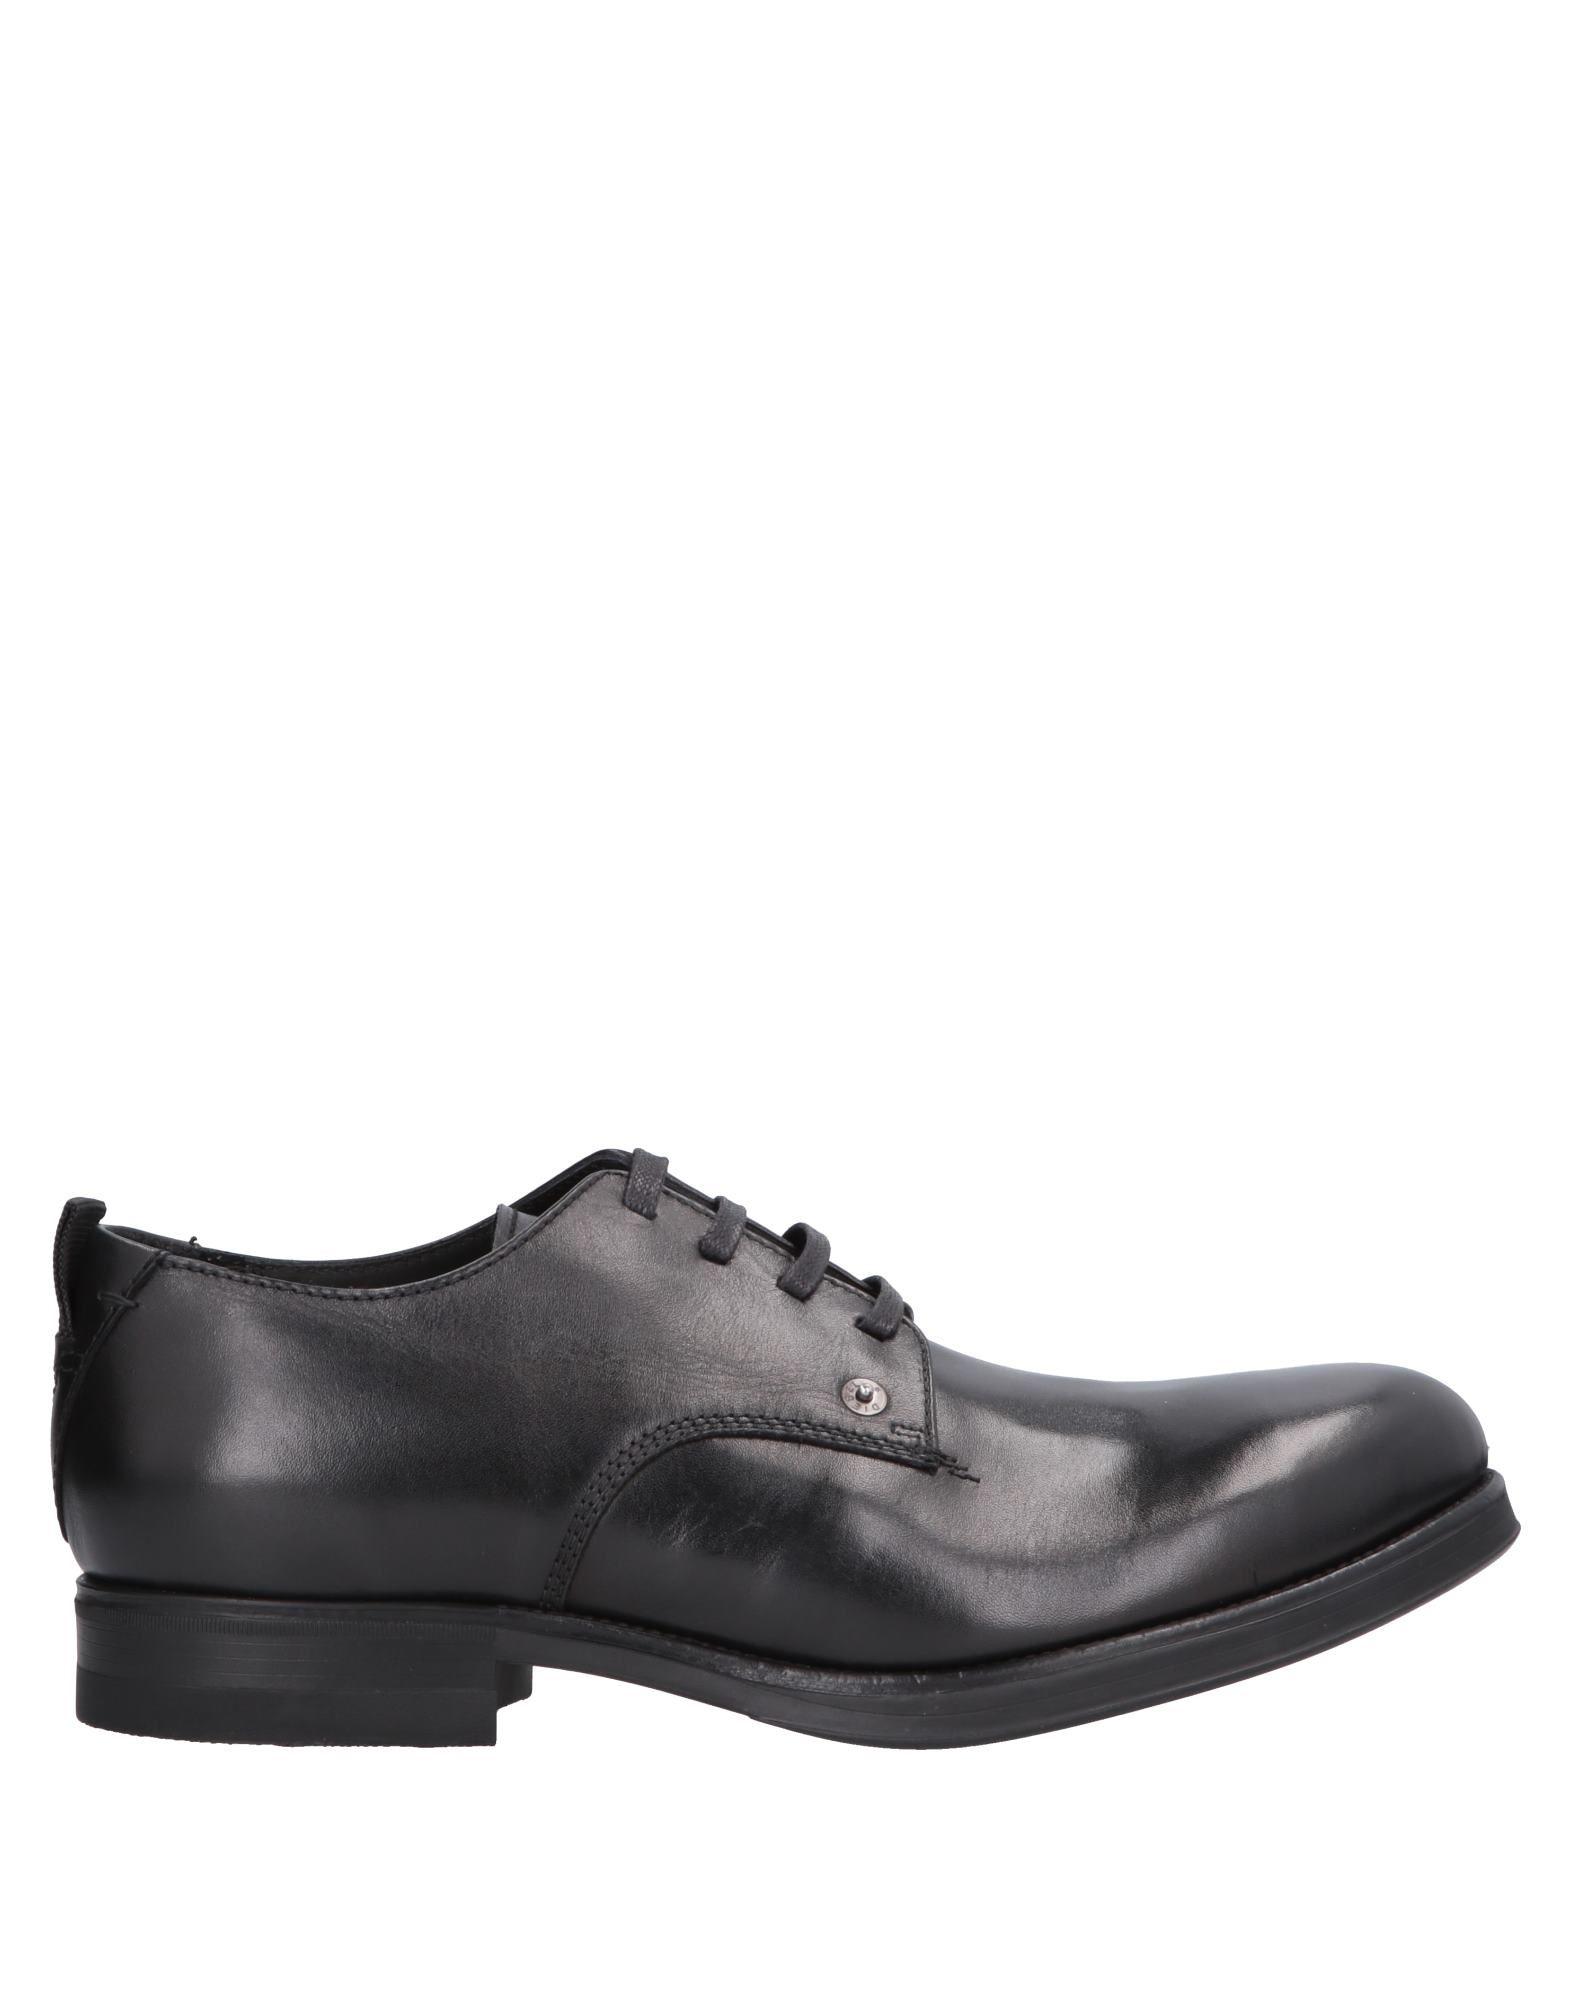 Фото - DIESEL Обувь на шнурках обувь на высокой платформе dkny